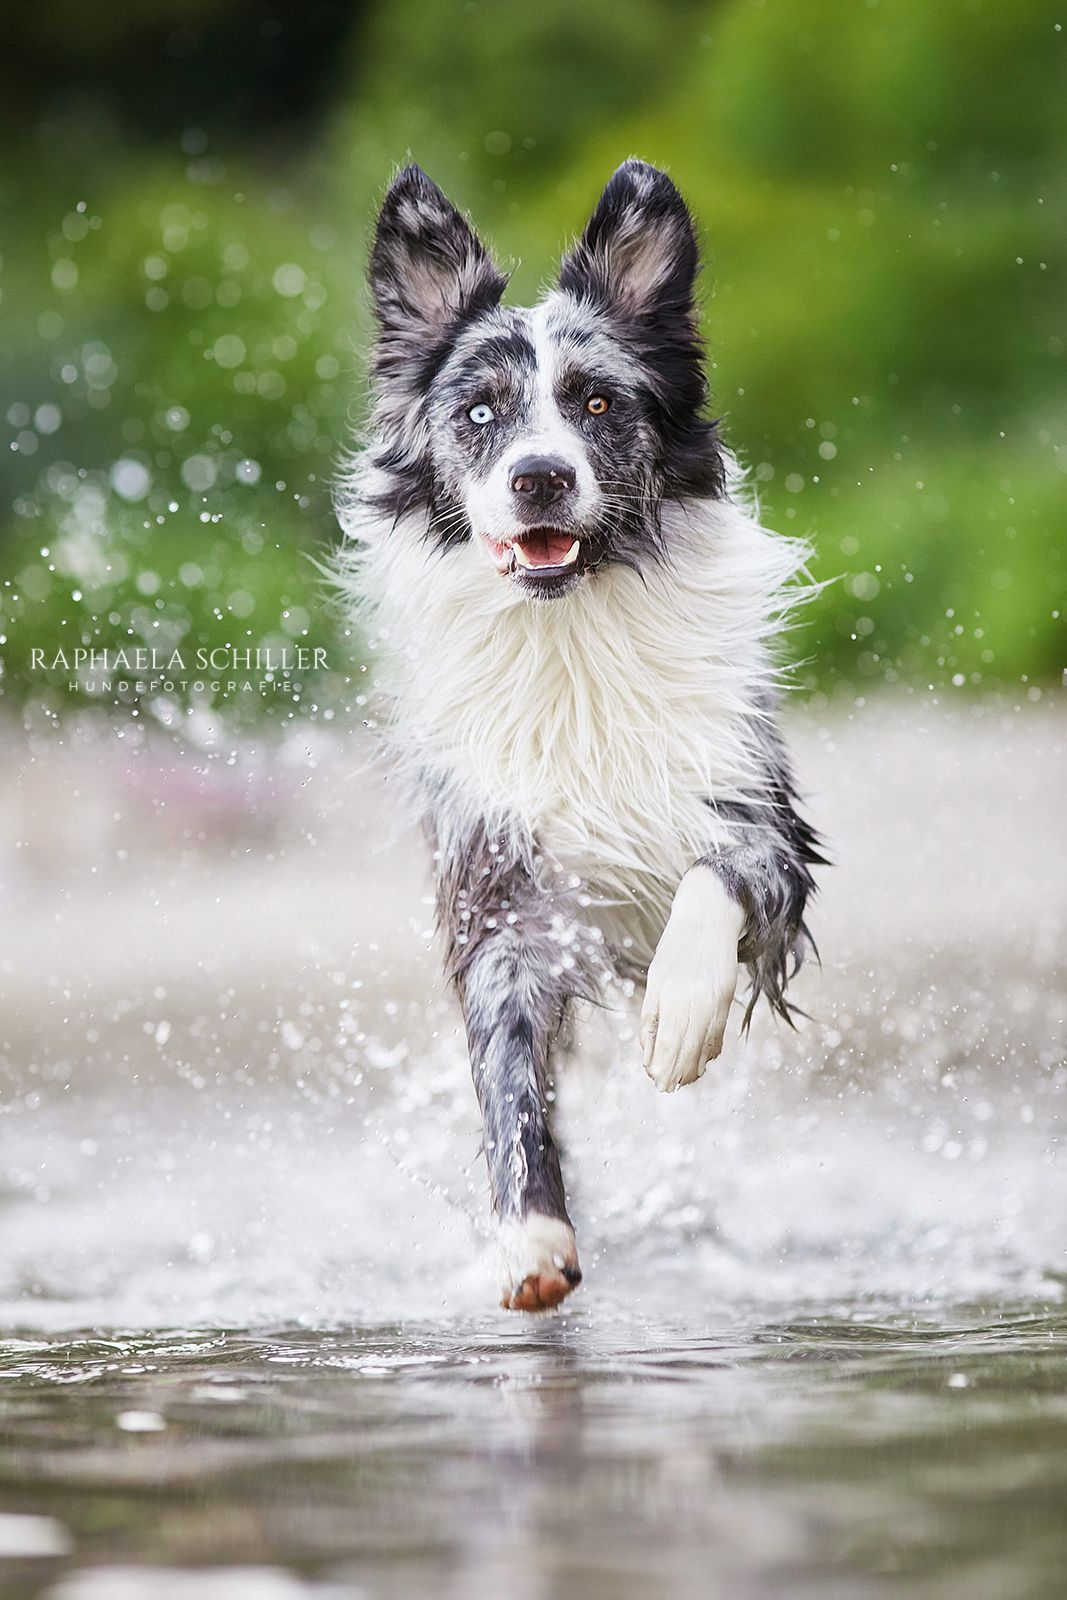 Pin By Soosyn On Animal Smiles Dog Photography Australian Shepherd Dogs